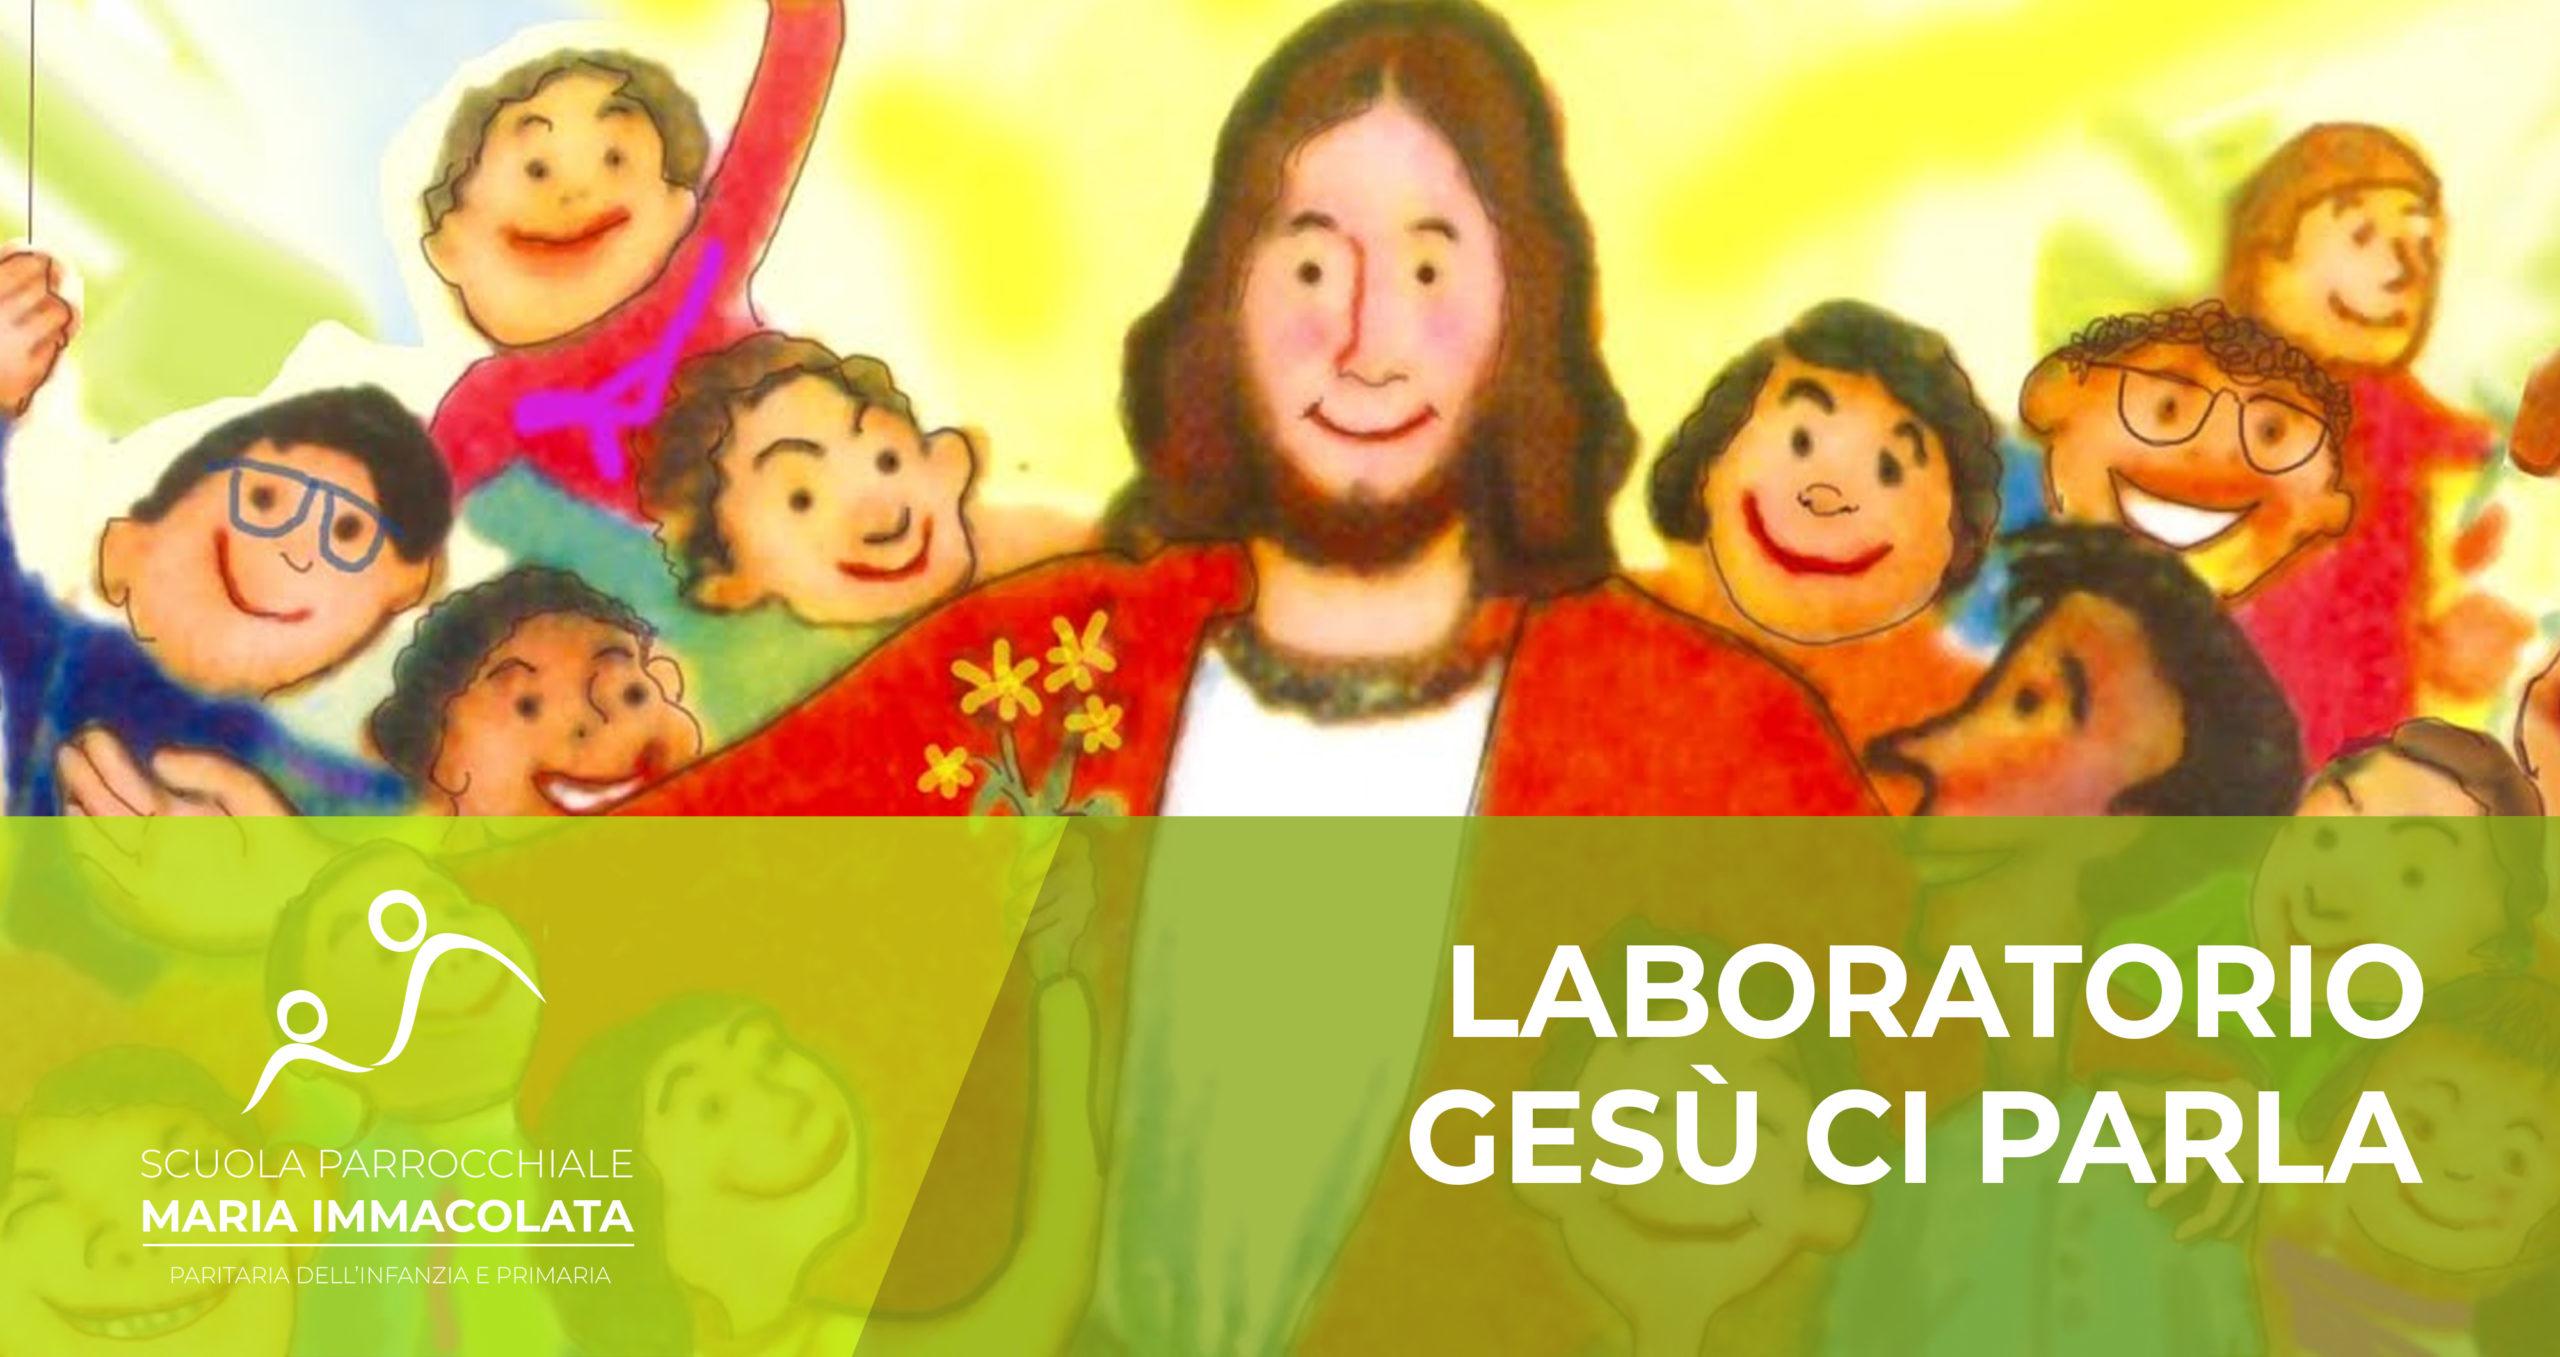 Gesù ci parla